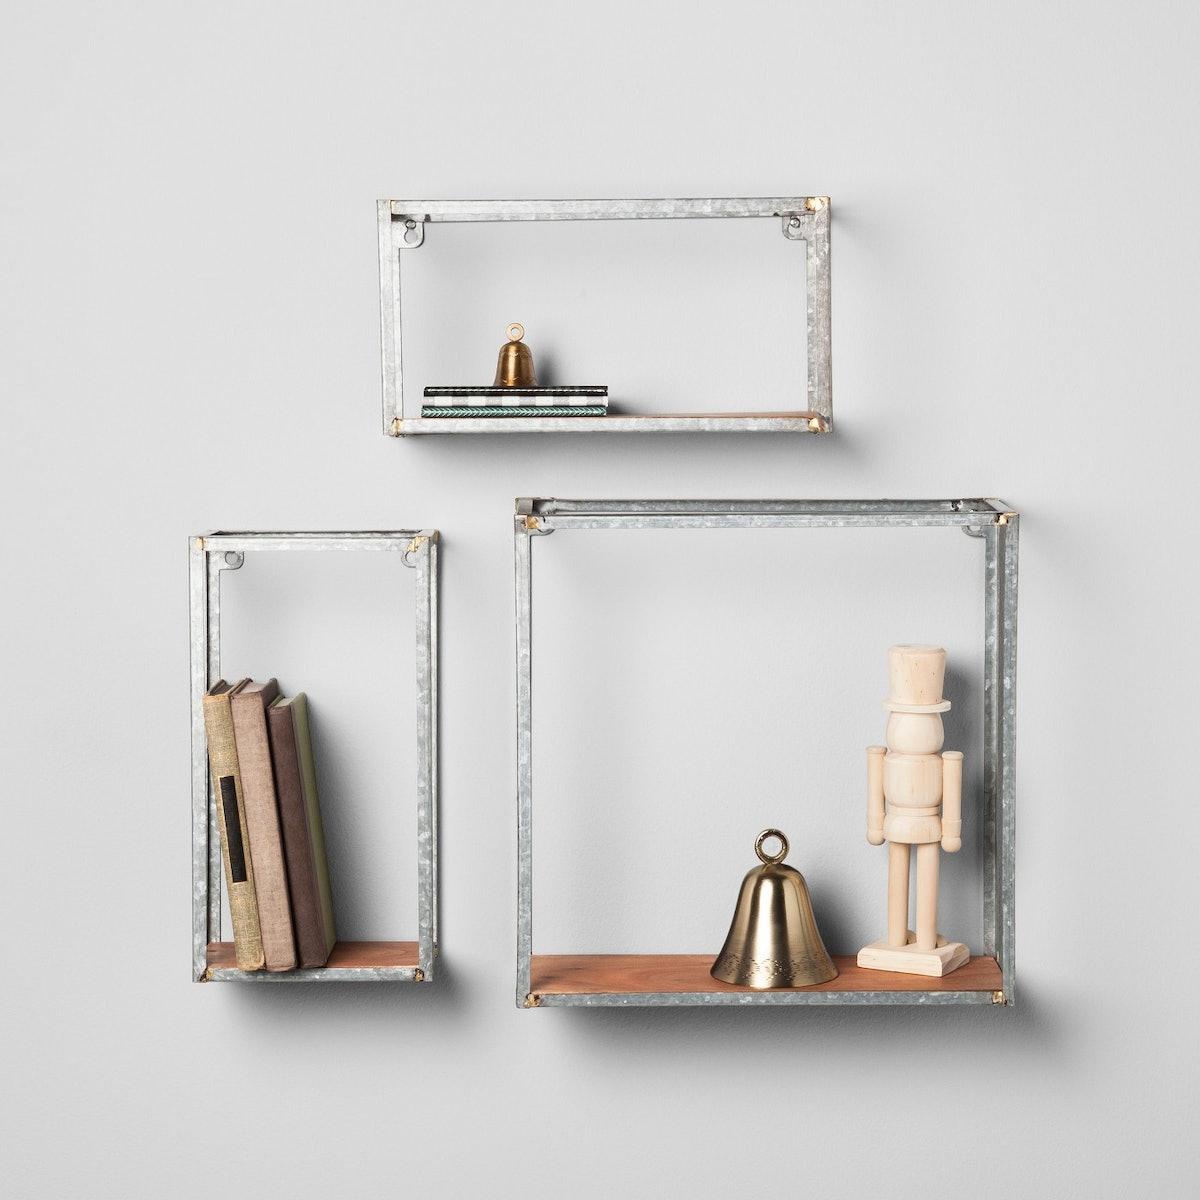 Galvanized Metal and Wood Wall Shelf Set - Hearth & Hand with Magnolia